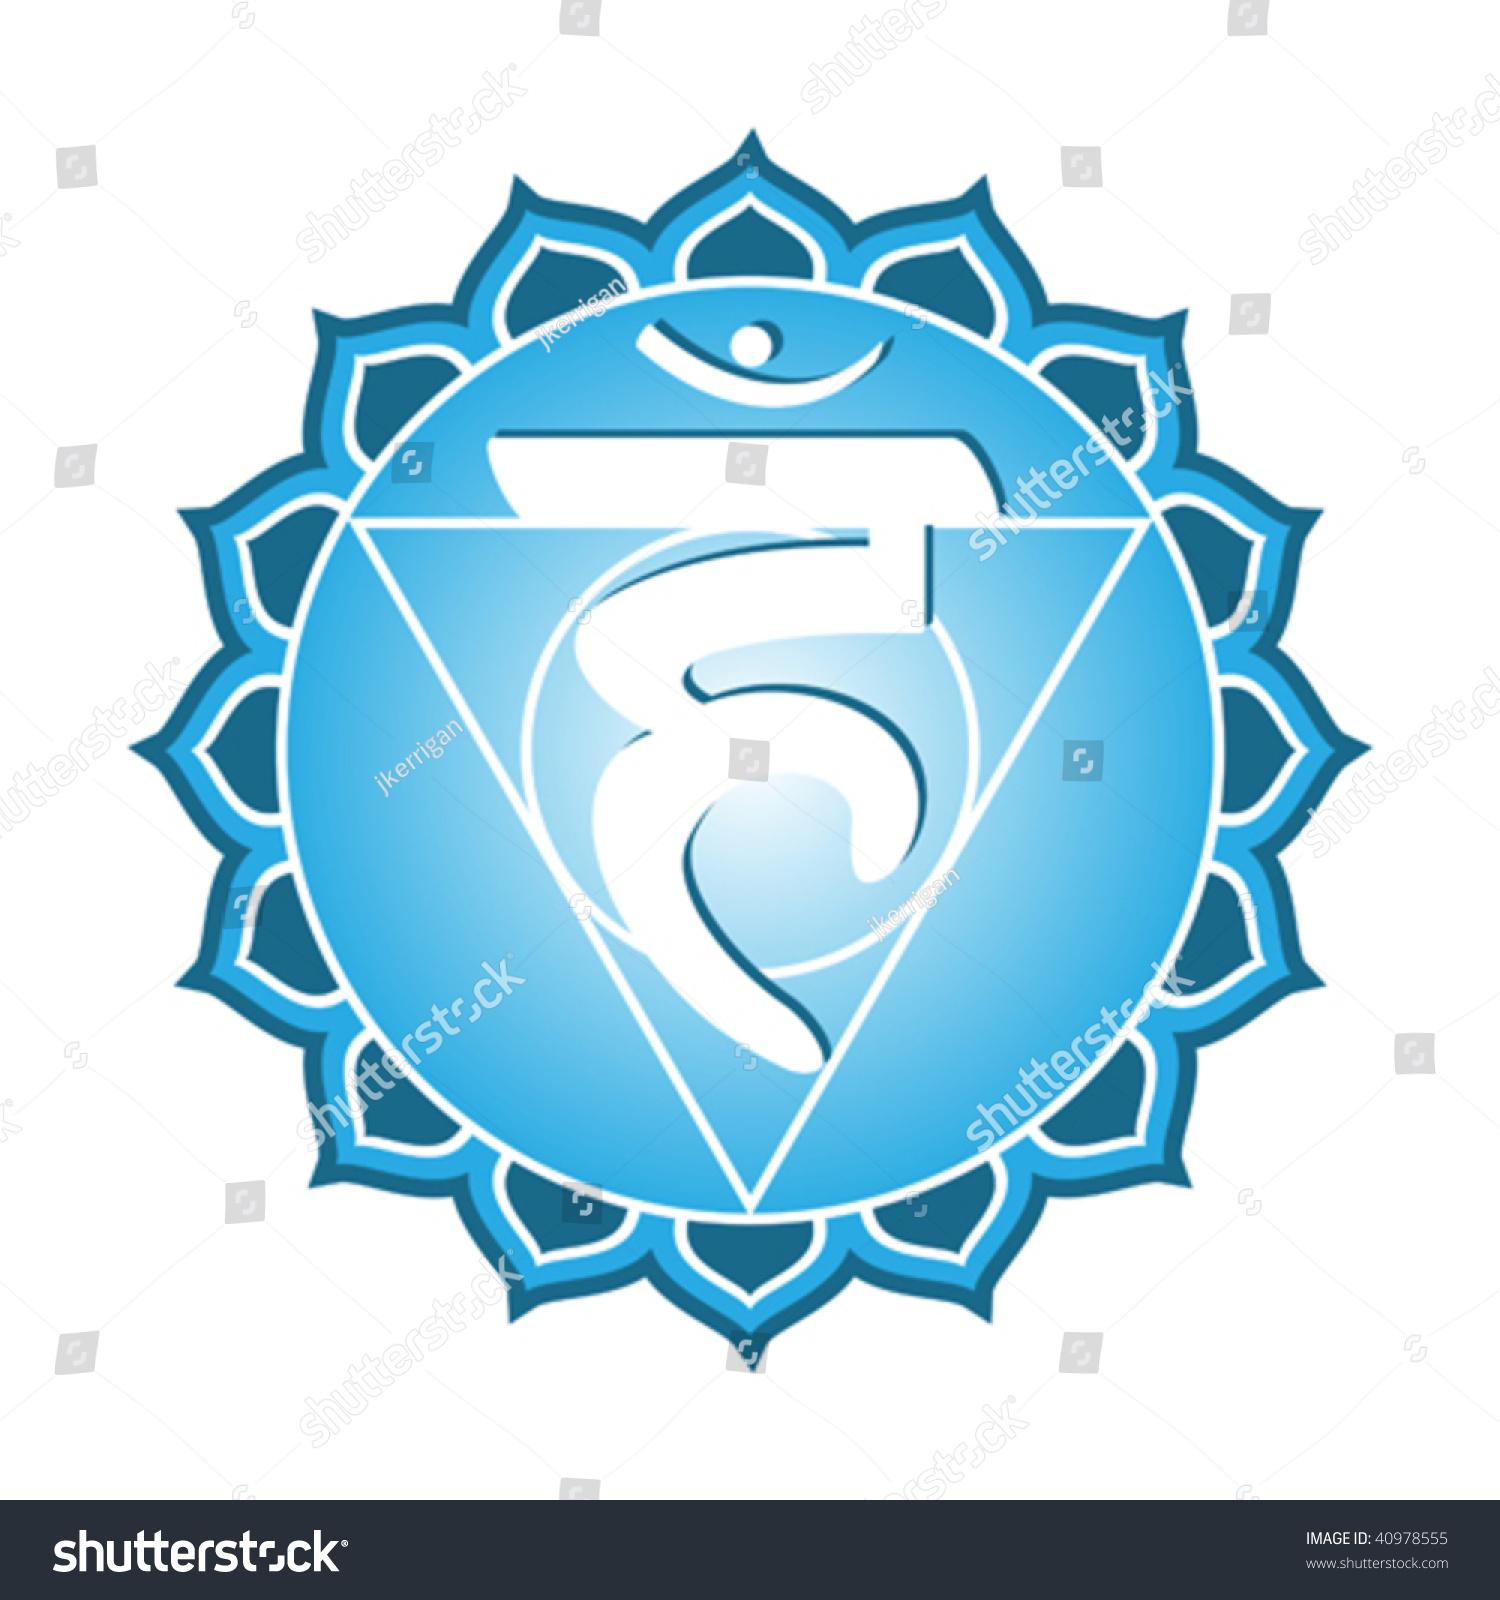 throat chakra symbols wwwpixsharkcom images